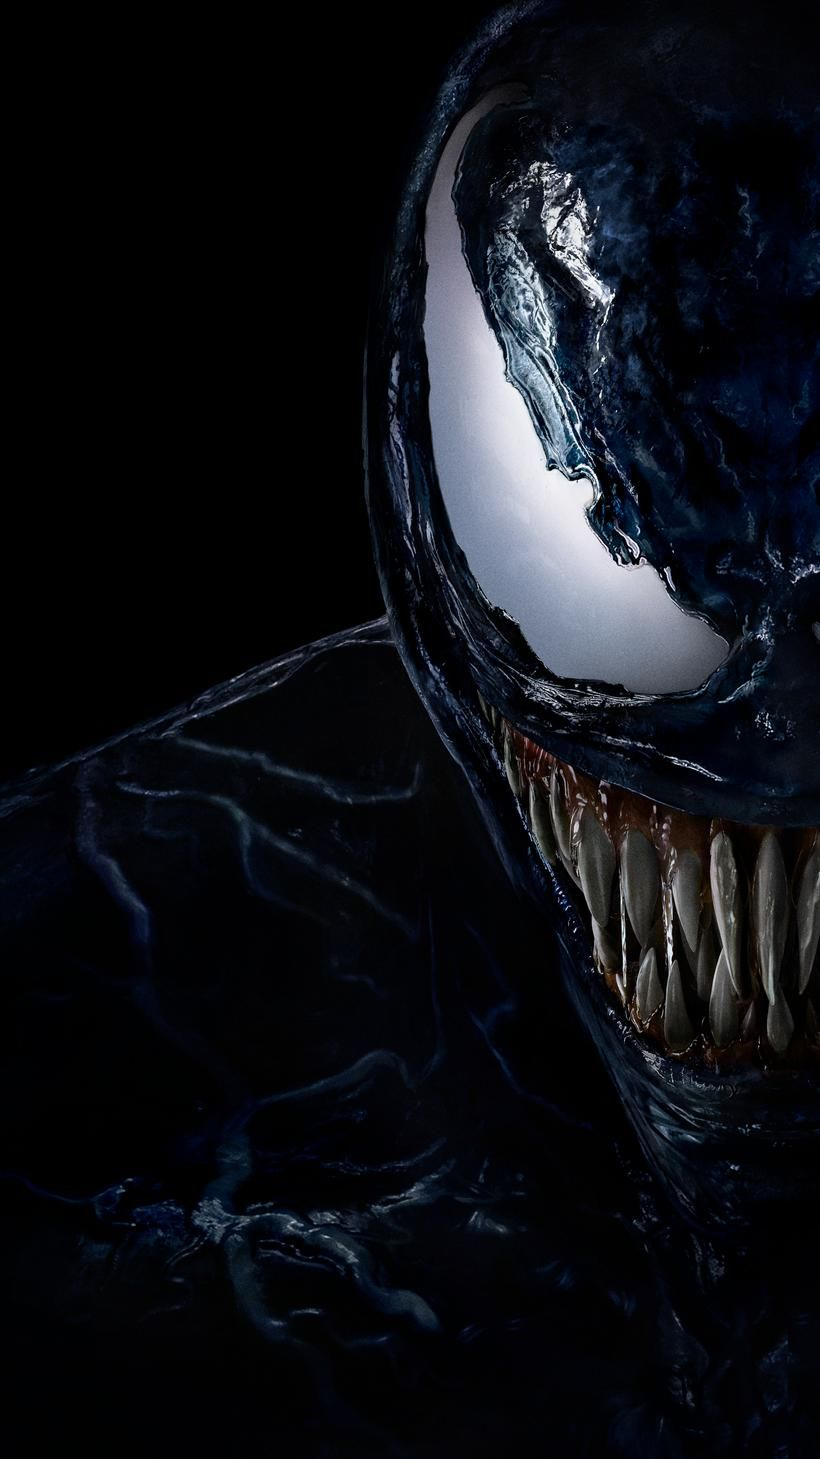 Wallpaper For Venom 2018 Venom Movie Venom Comics Marvel Venom